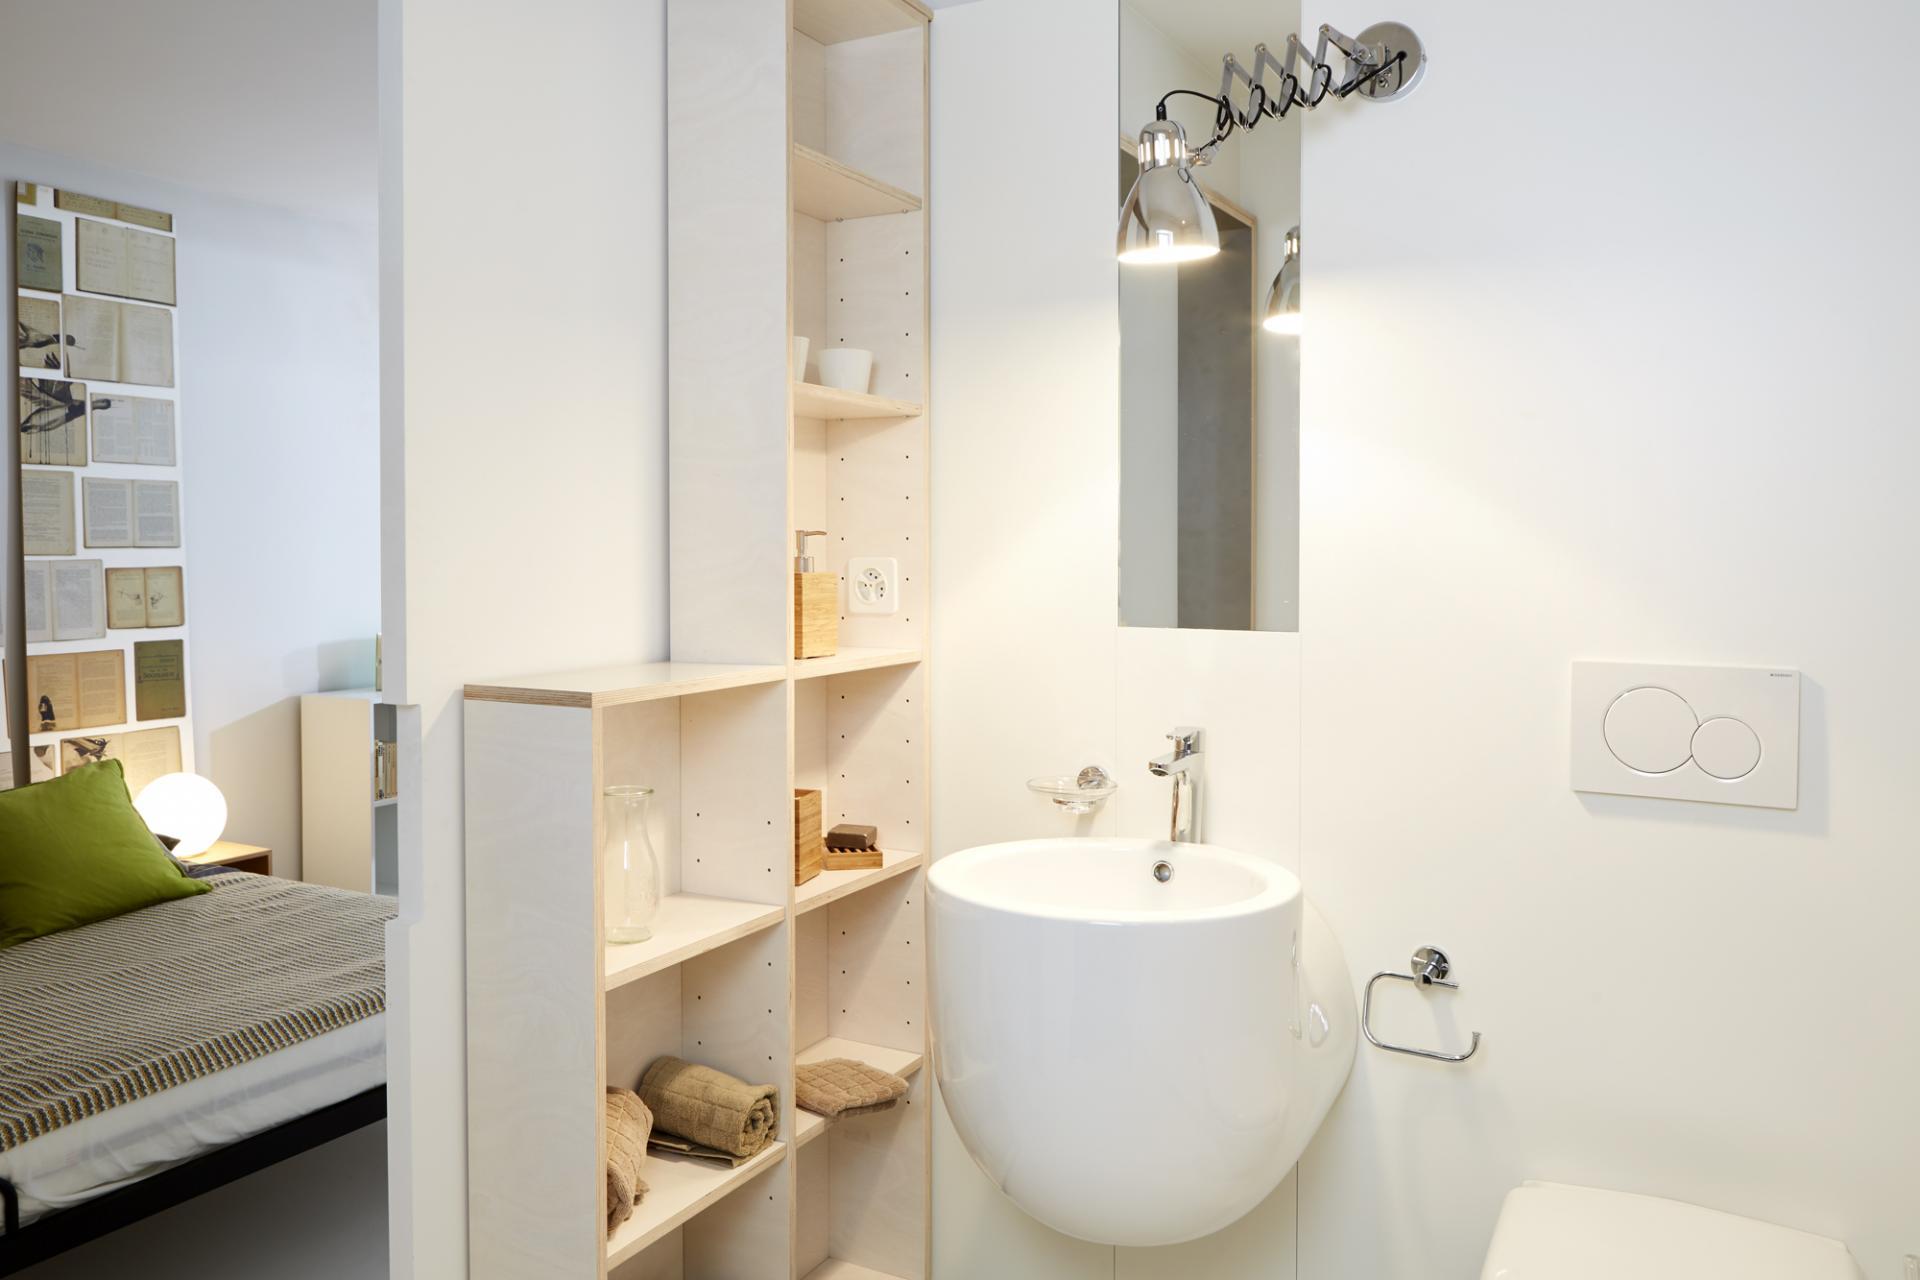 Bathroom at Morache Apartments